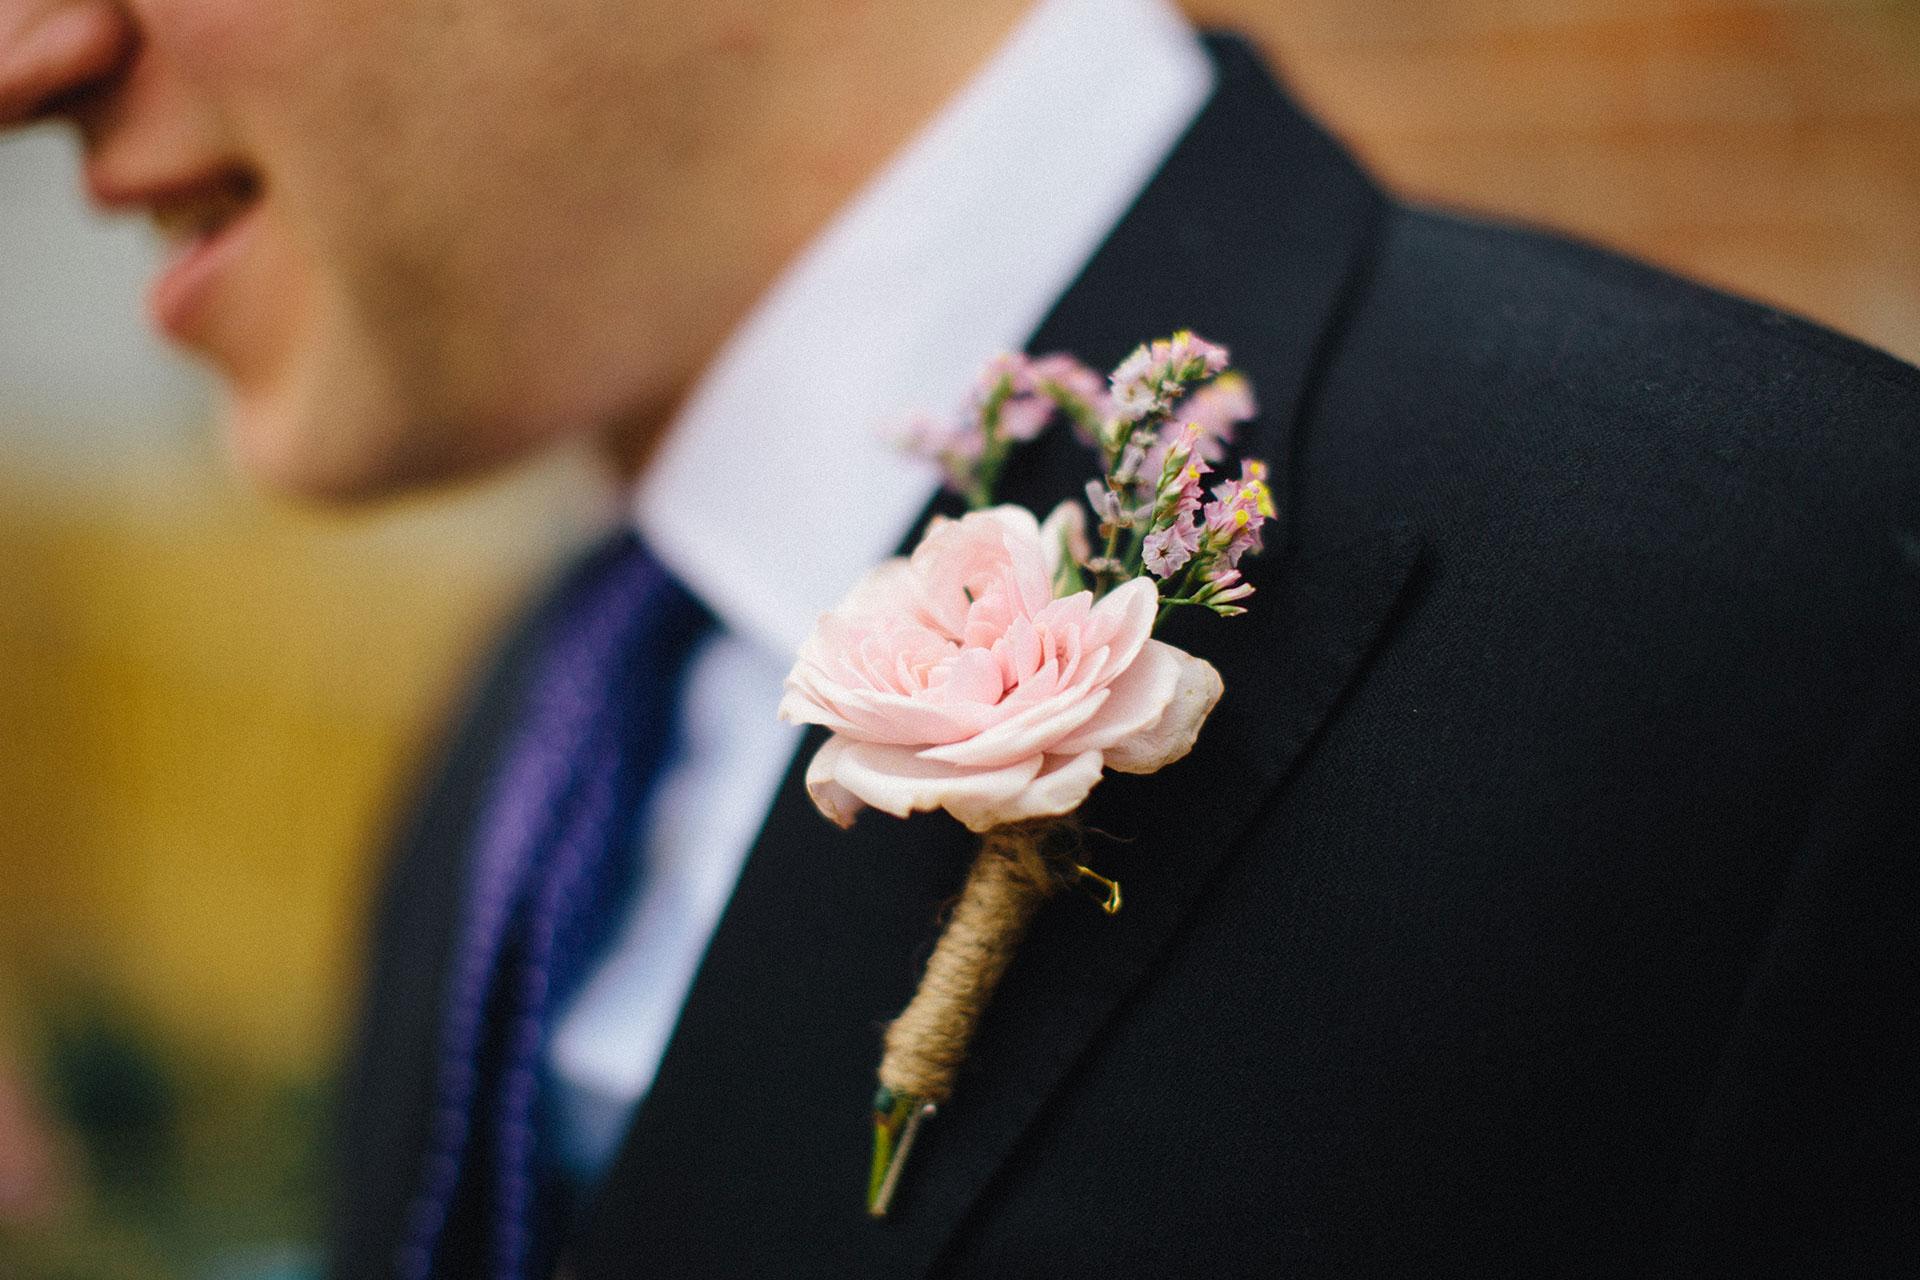 Langar-Hall-wedding-photographer-in-Nottinghamshire-Michael-Newington-Gray-35.jpg